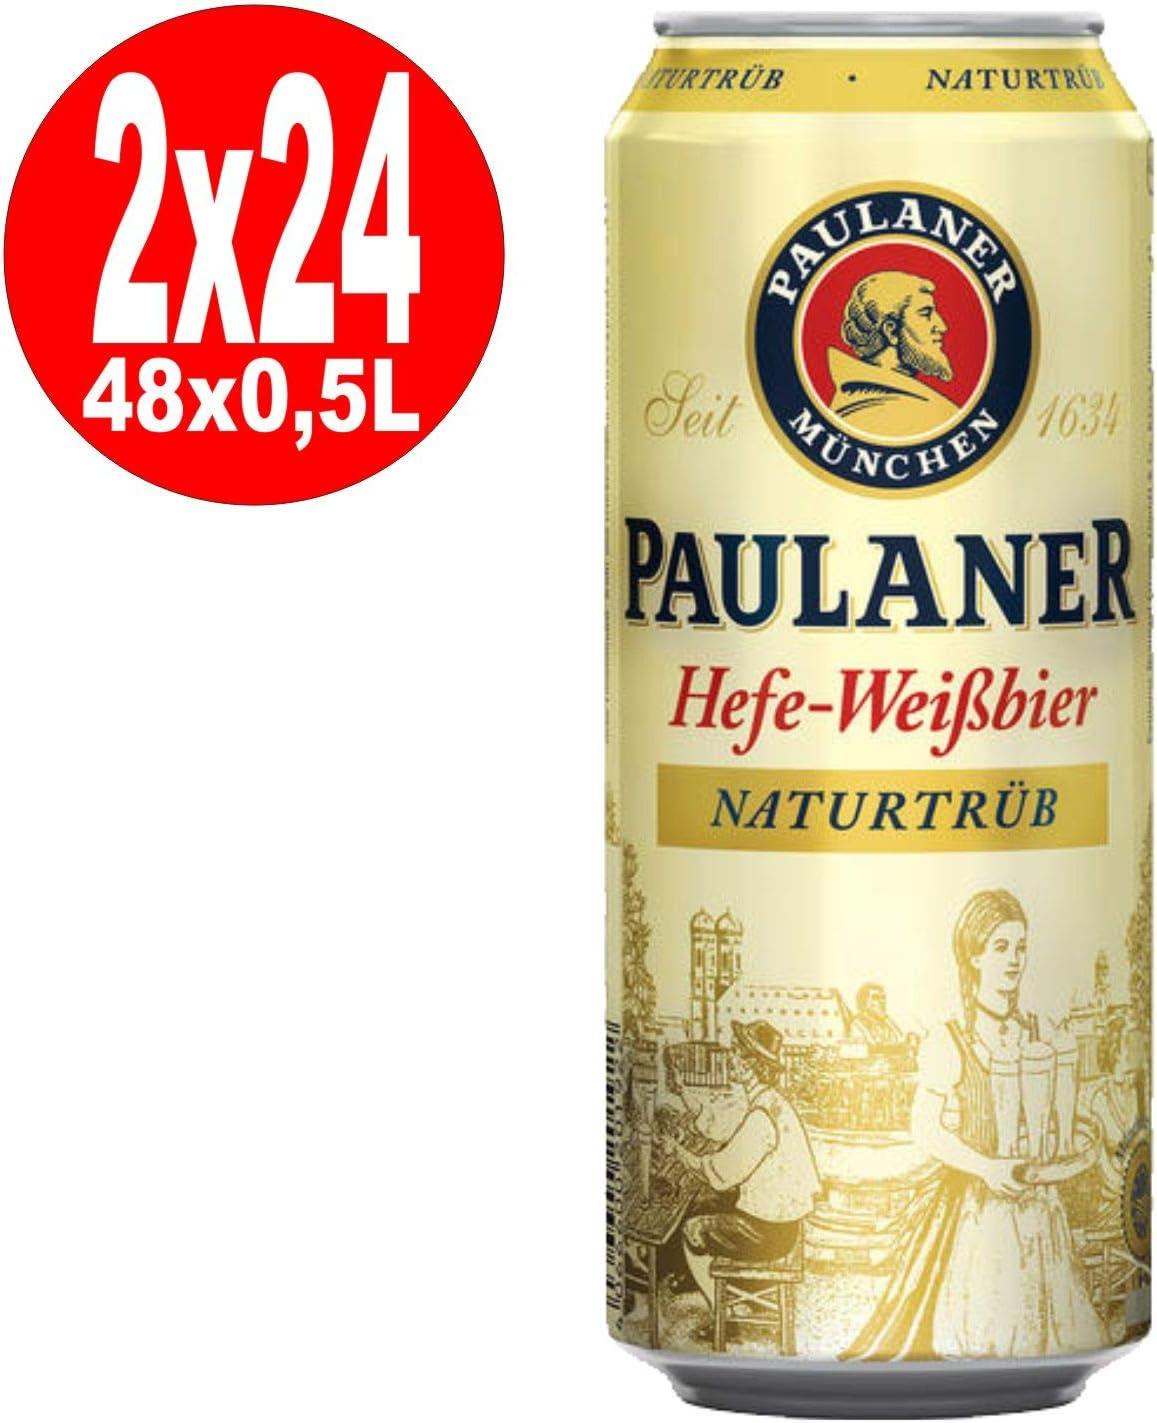 2 x 24 x Paulaner Hefeweissbier naturaleza nublado 0,5L estaño 5,5% Vol.alc